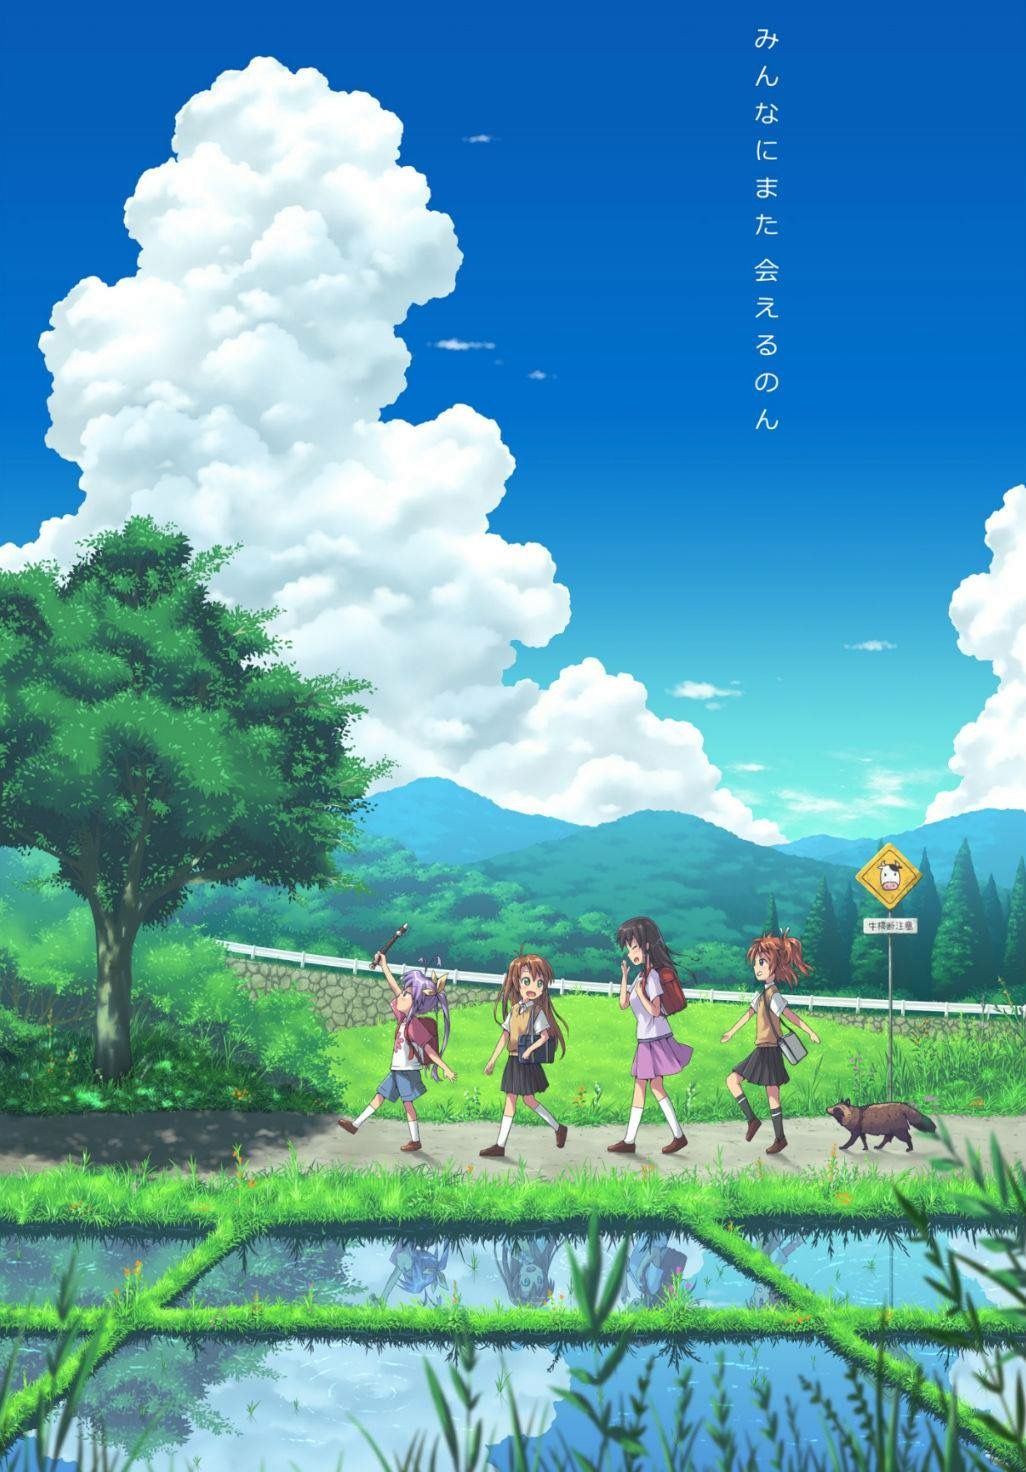 Non Non Biyori Anime Scenery Anime Family Scenery